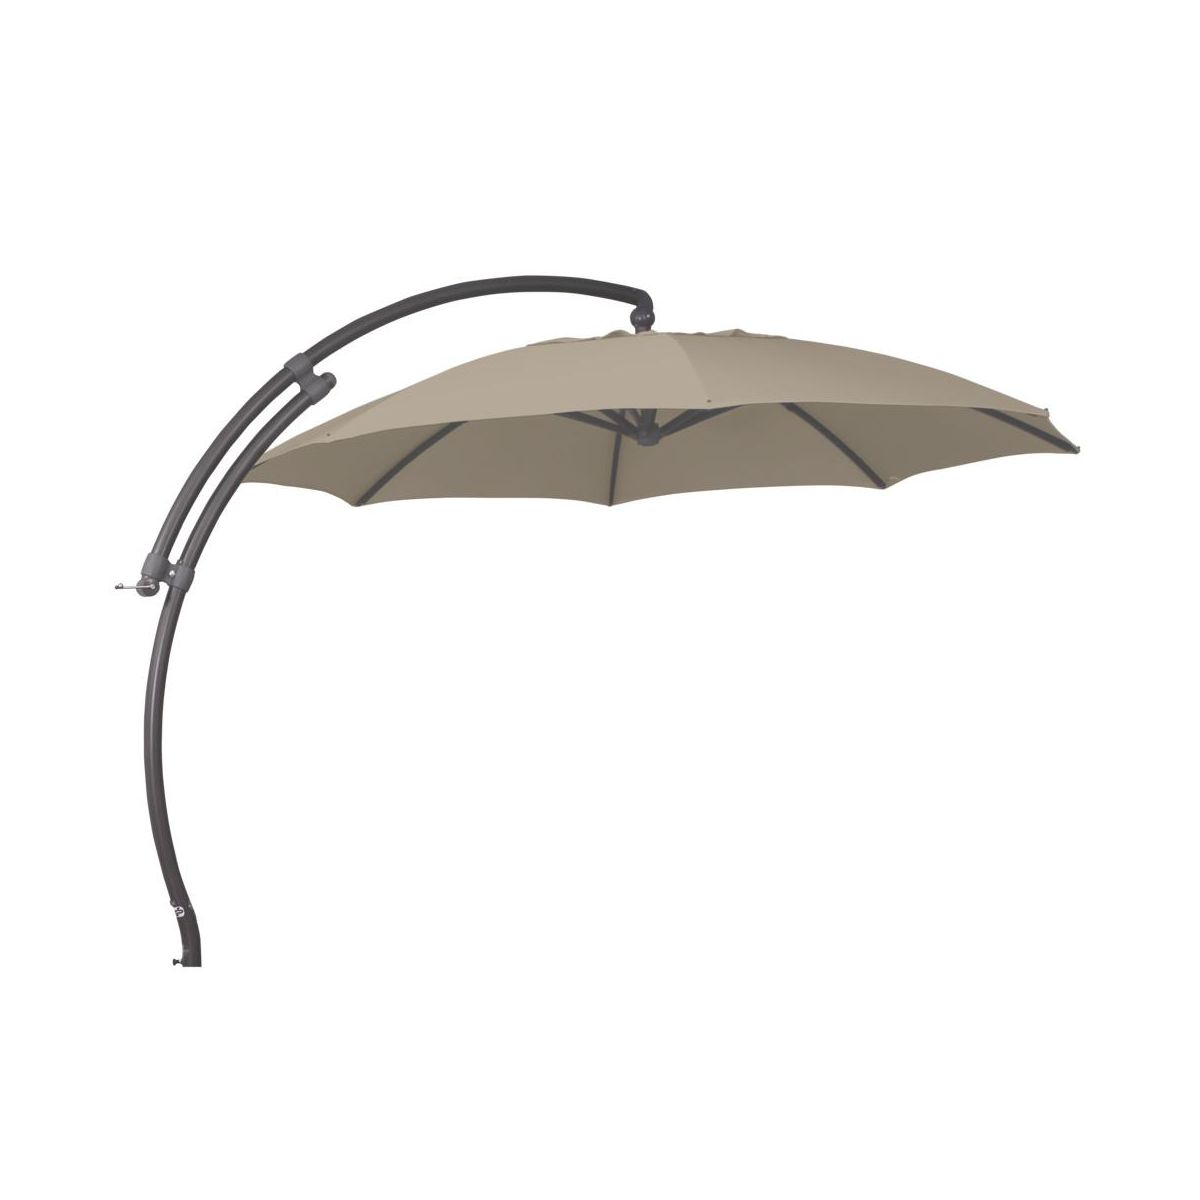 parasol ogrodowy easy sun 375 sun garden sprawd opinie w leroy merlin. Black Bedroom Furniture Sets. Home Design Ideas